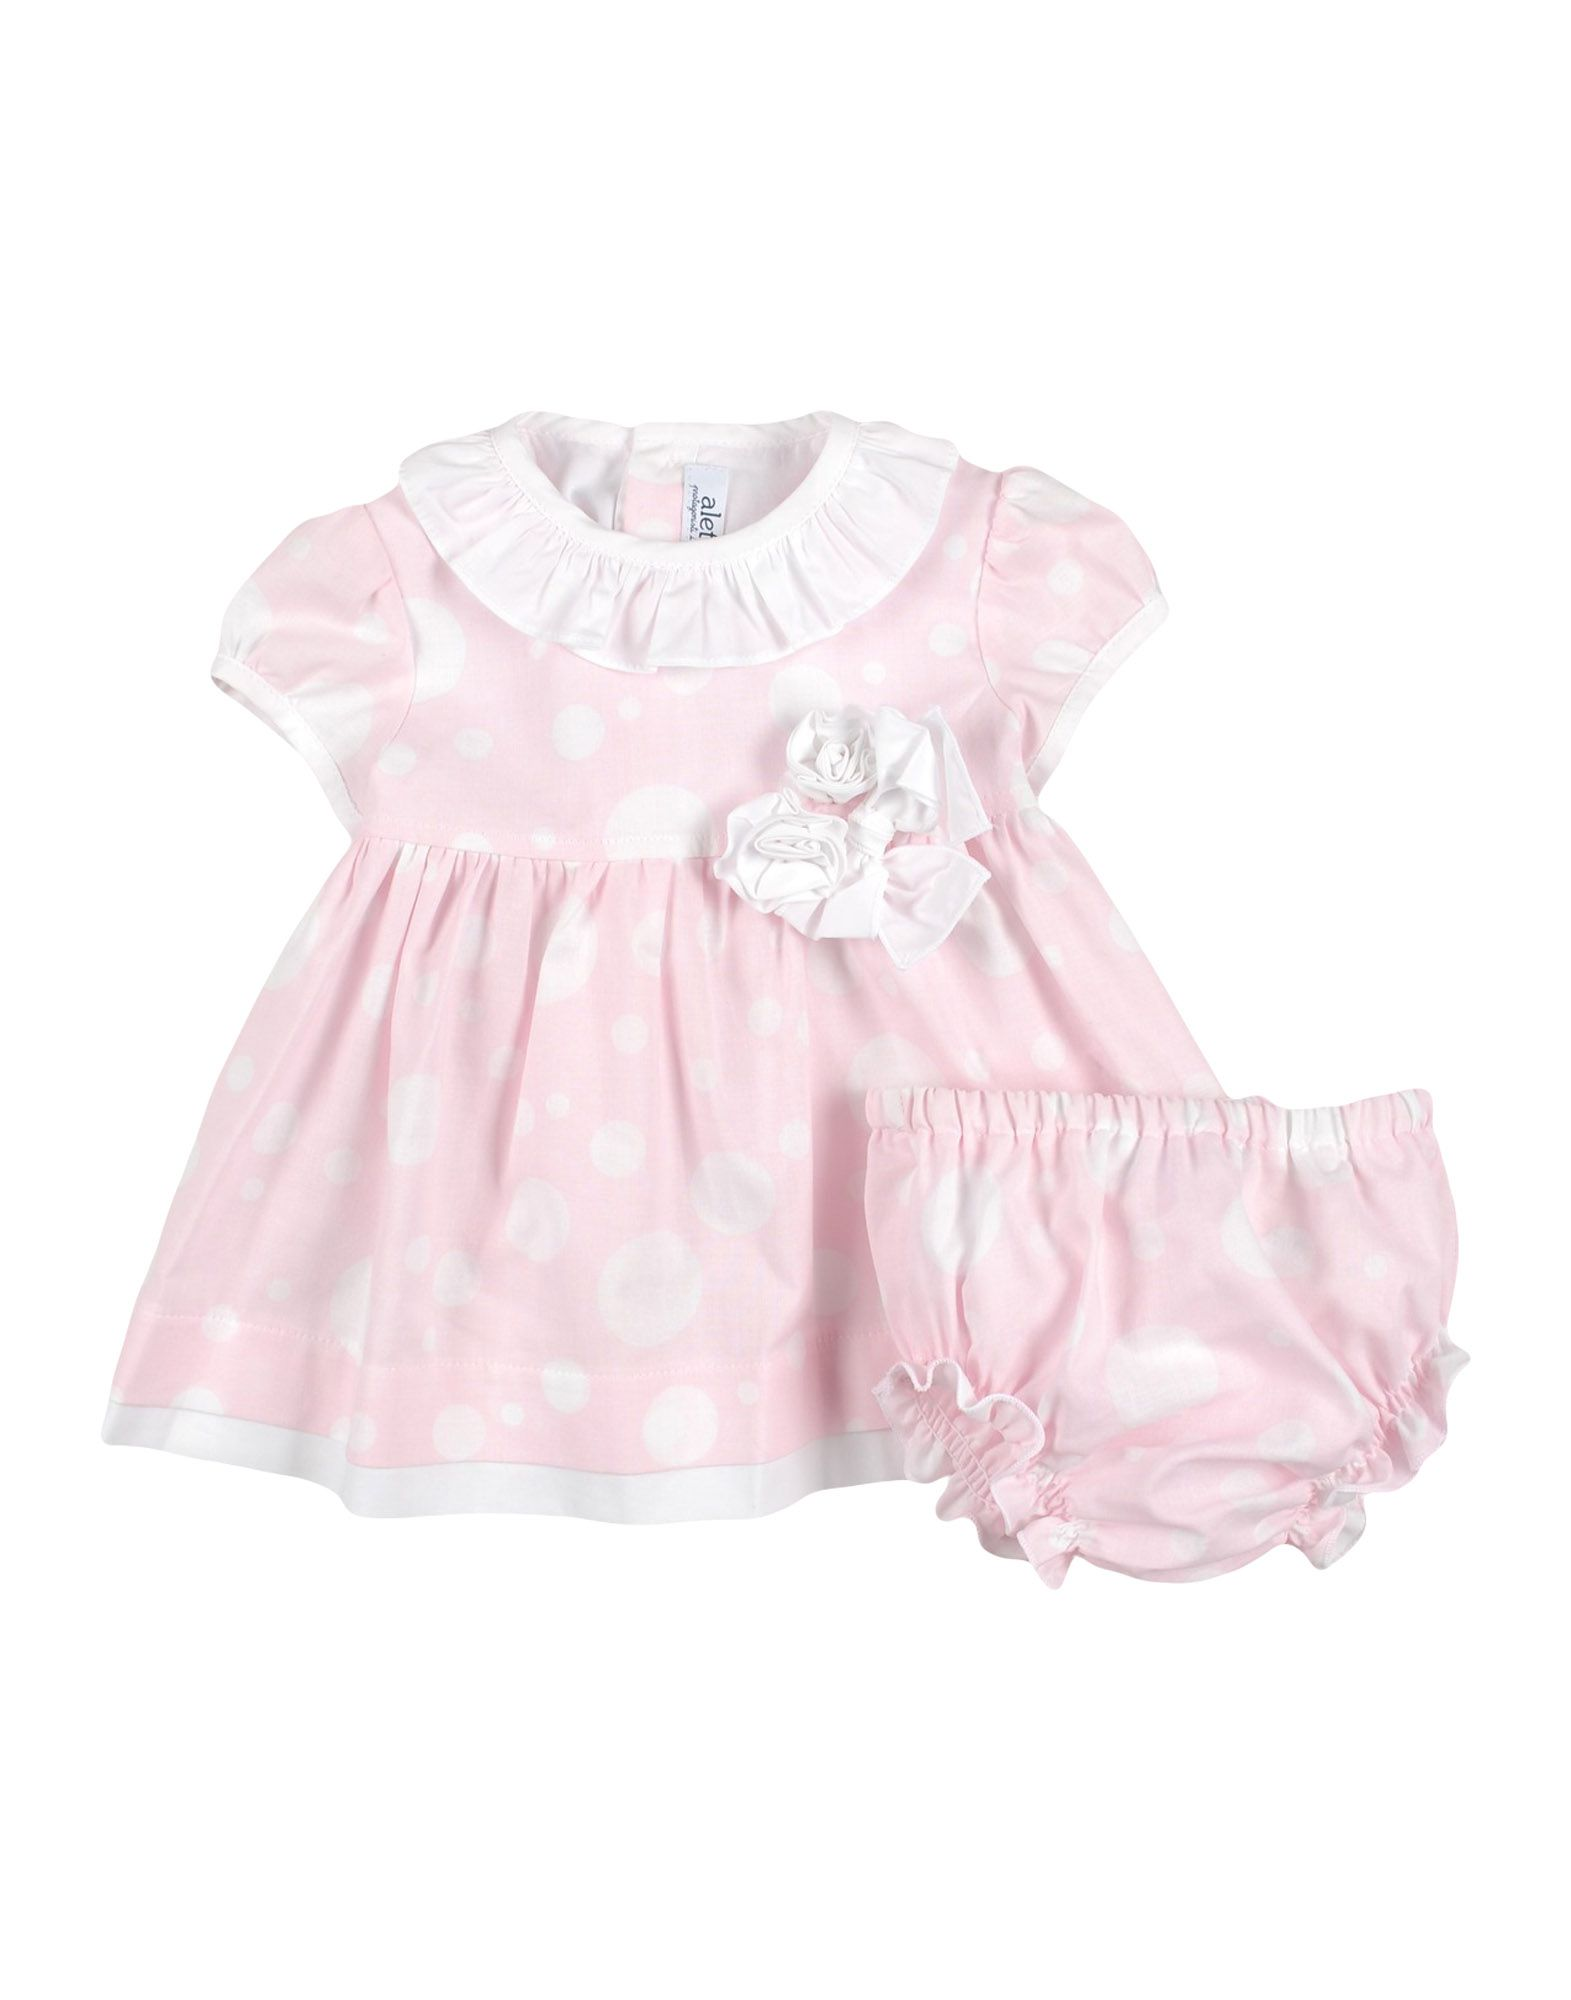 ALETTA ワンピース・ドレス ピンク